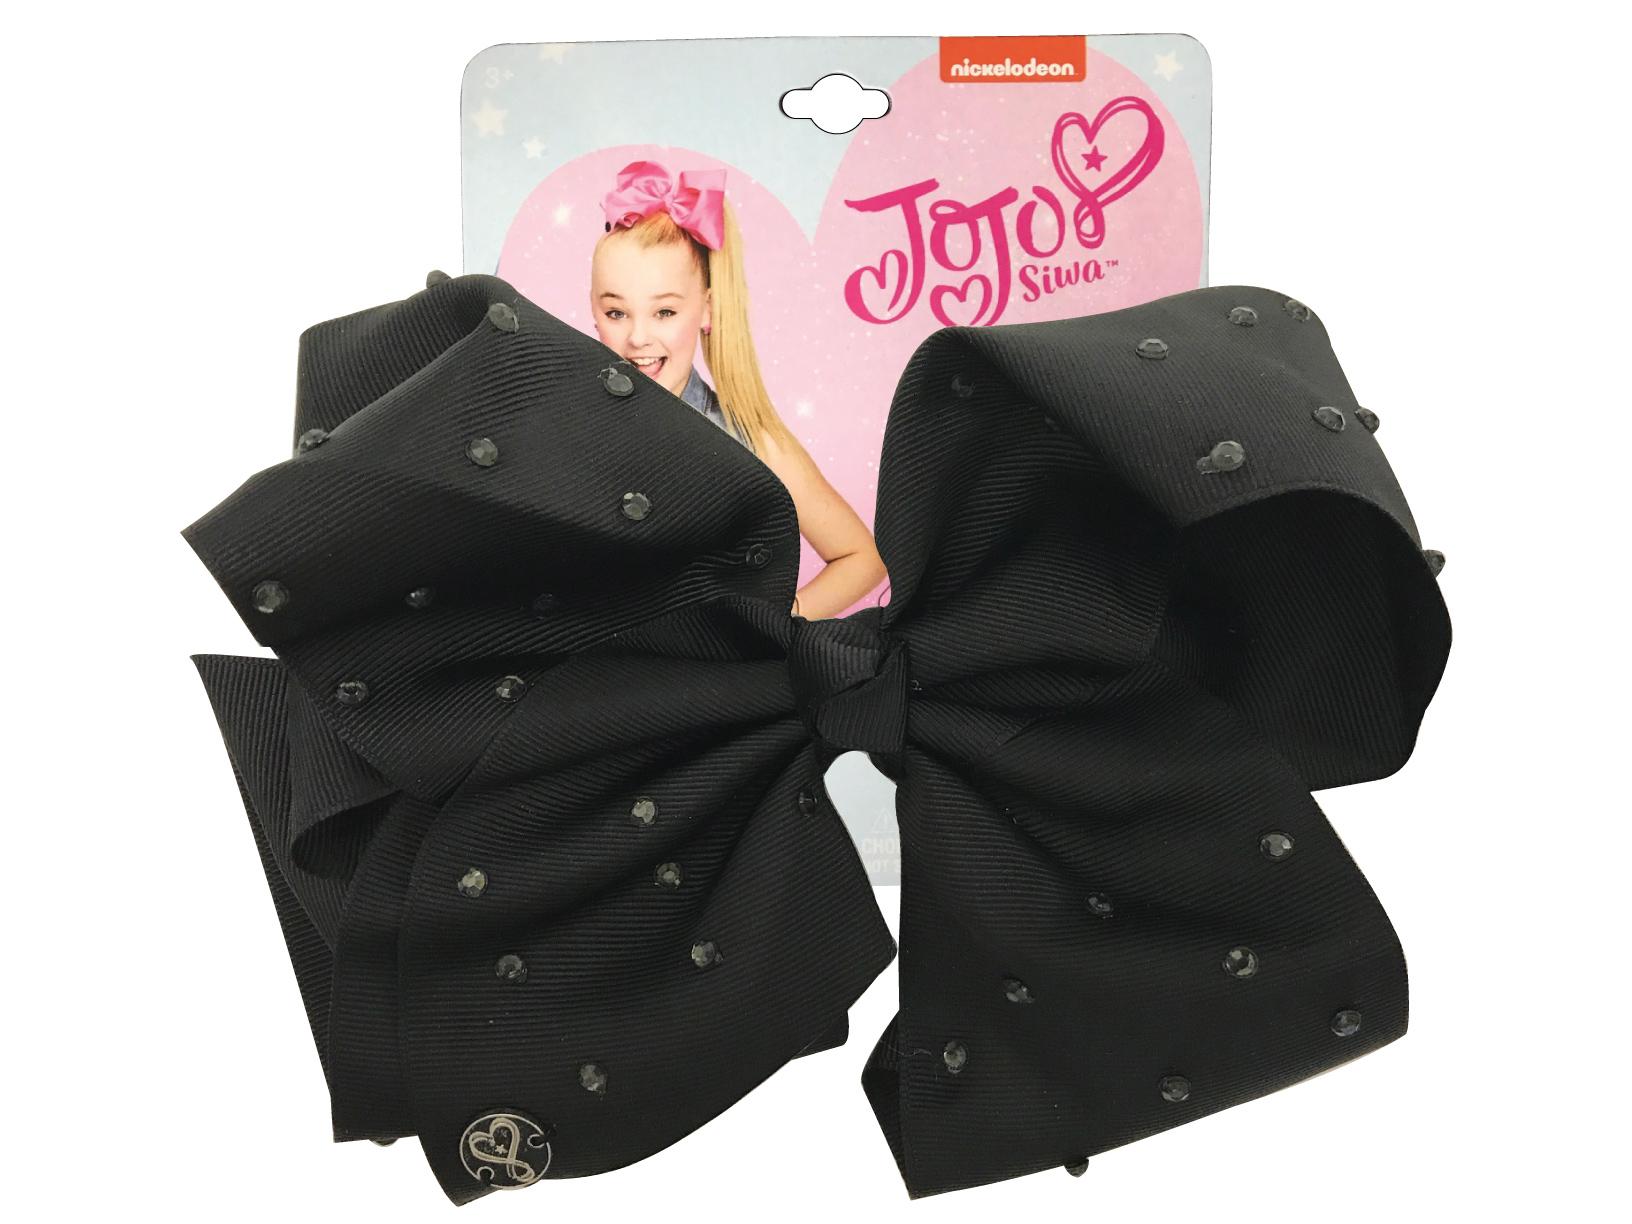 JoJo Siwa Large Cheer Hair Bow (Black with Rhinestones)